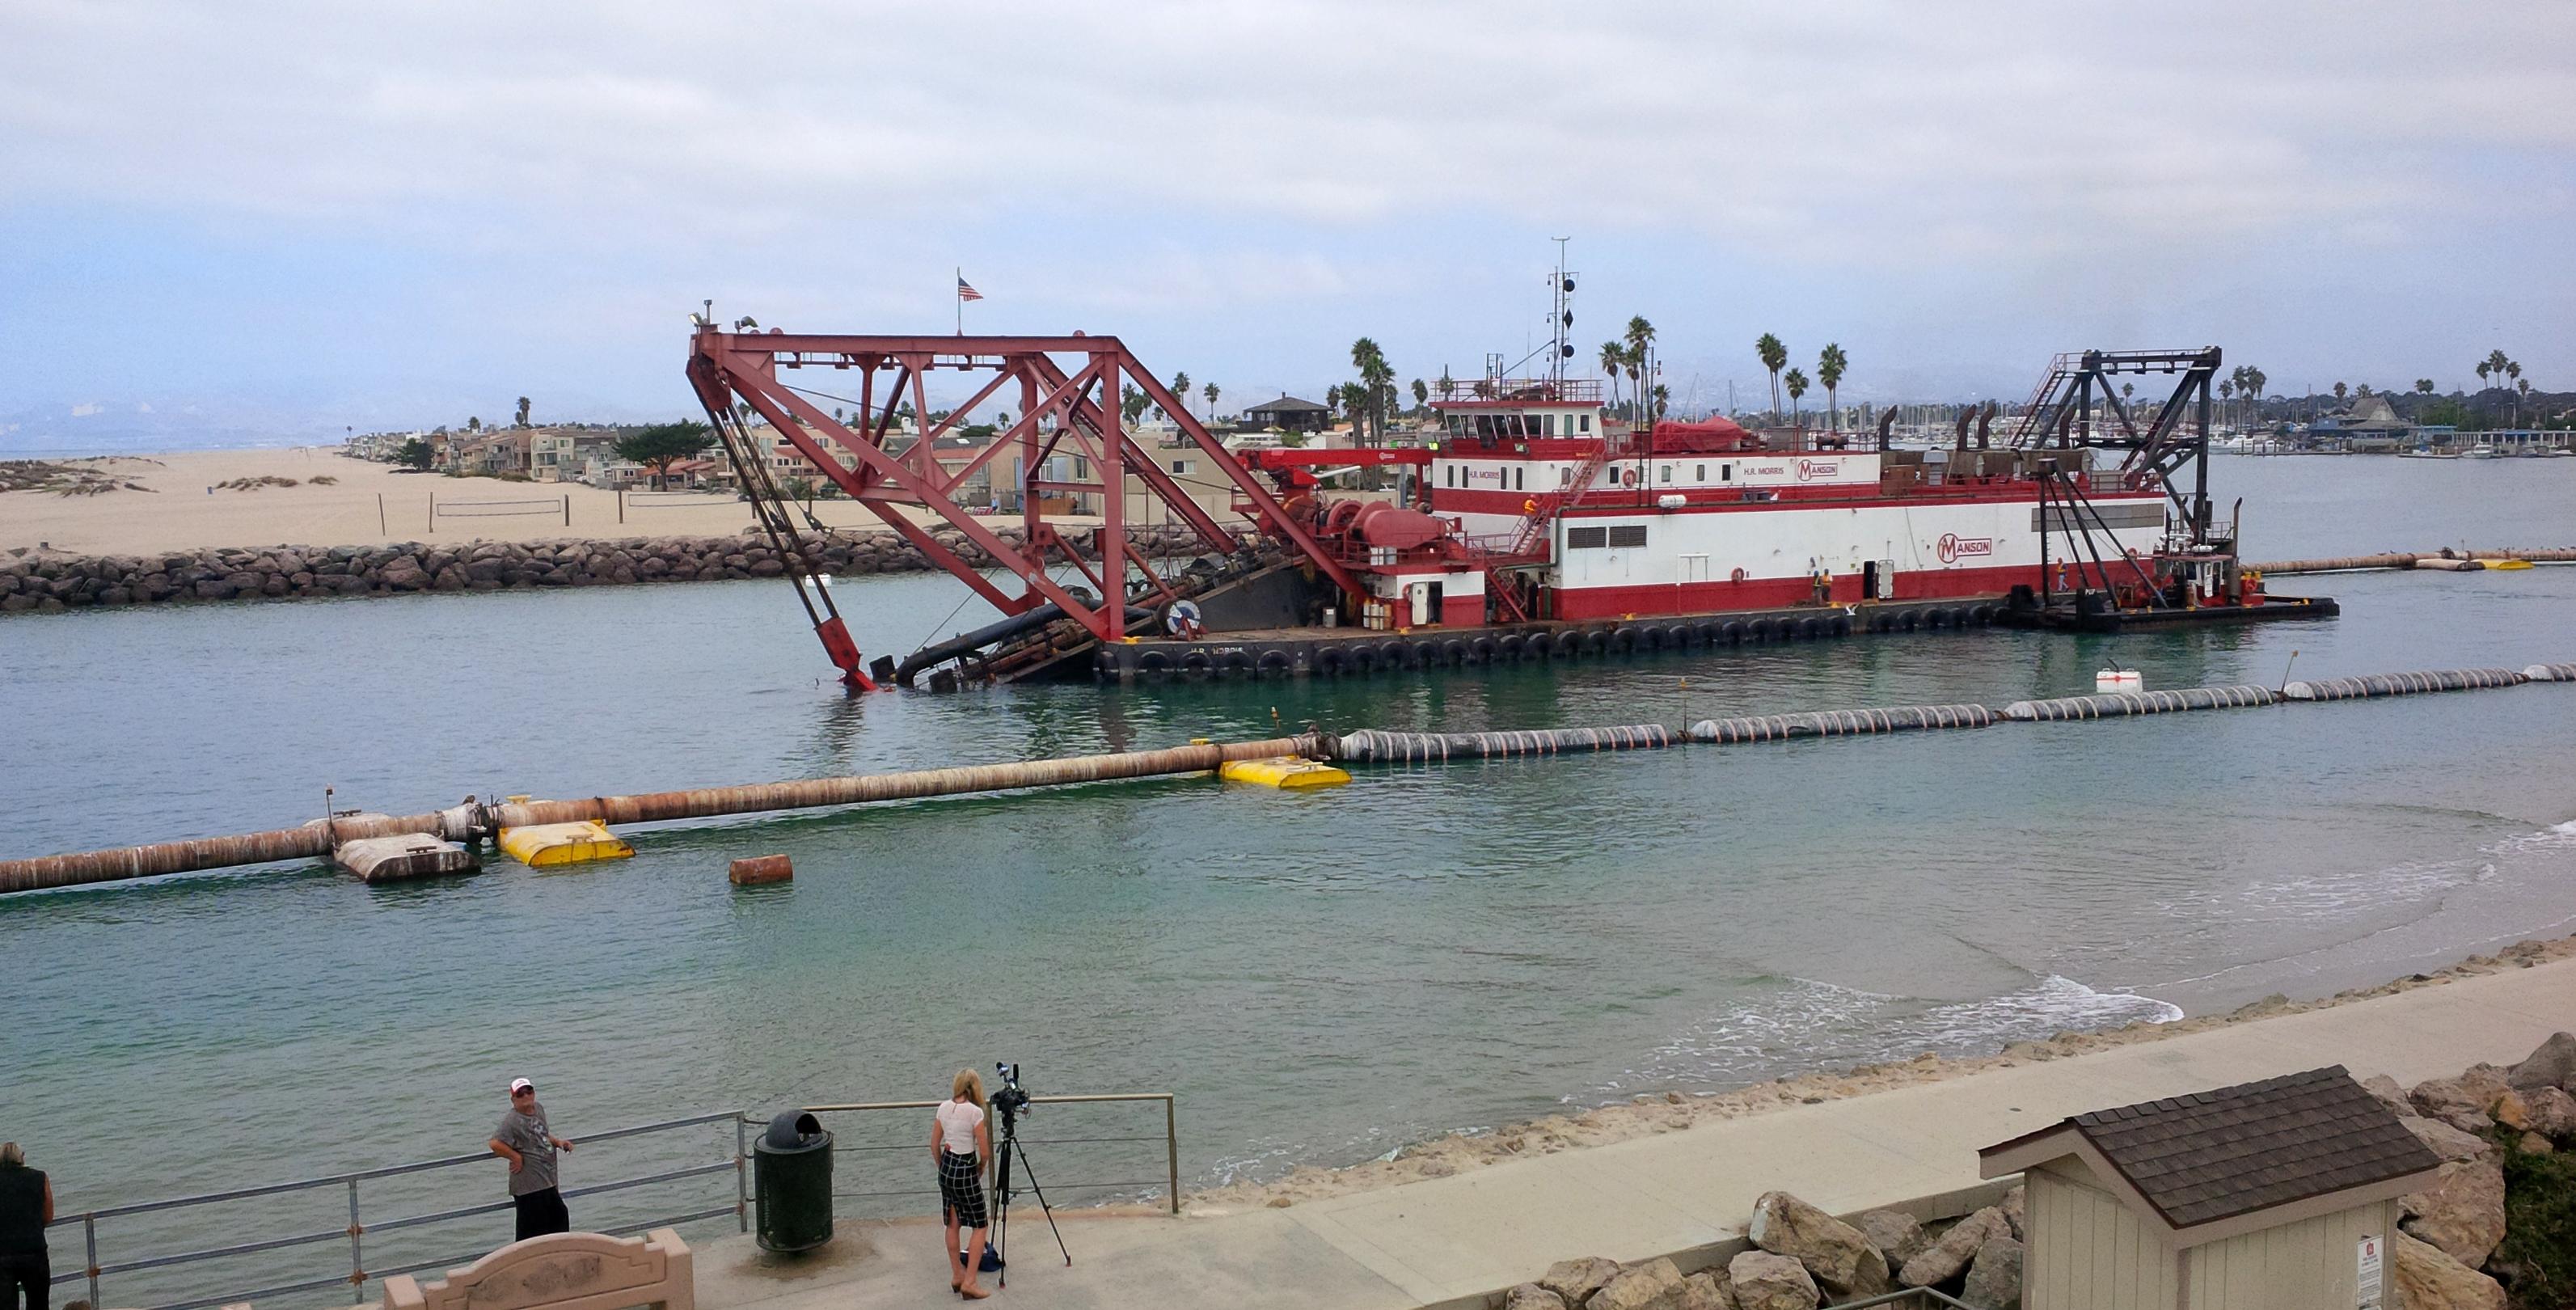 Channel Islands dredging begins > Los Angeles District > Los